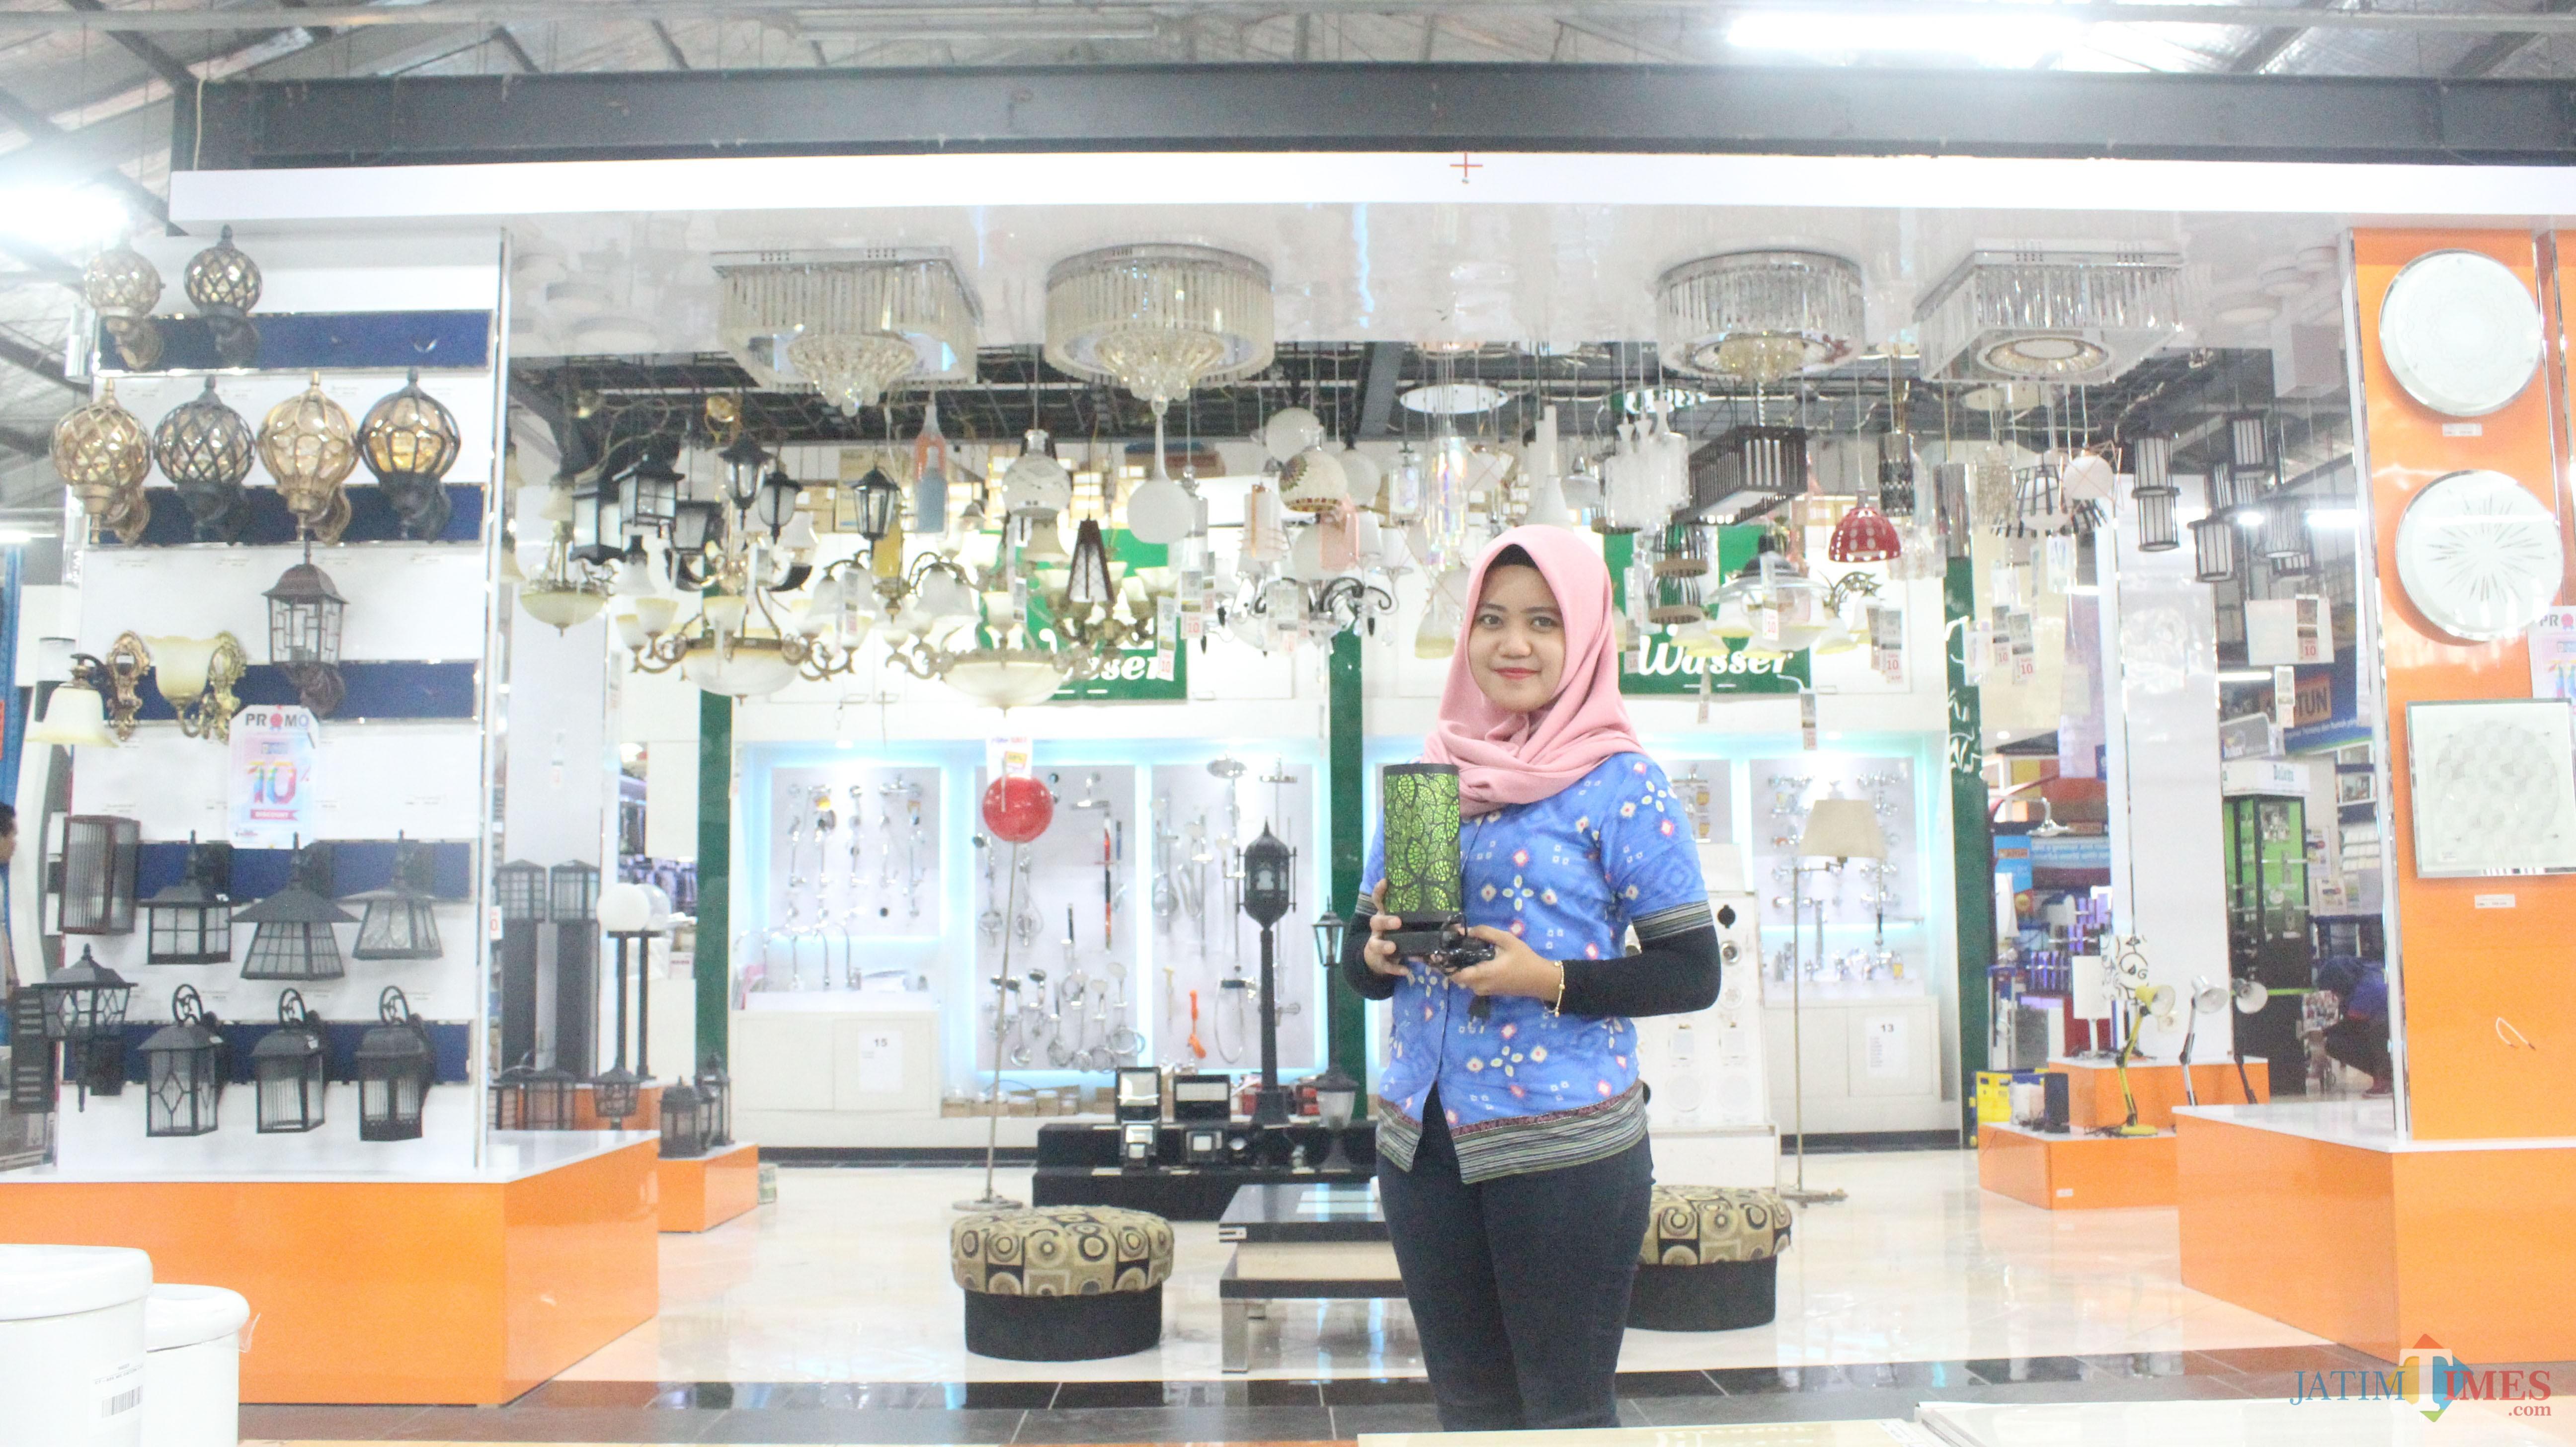 Karyawan menunjukkan produk lampu Lumina yang sedang promo di Graha Bangunan.(Foto : Aunur Rofiq/BlitarTIMES)